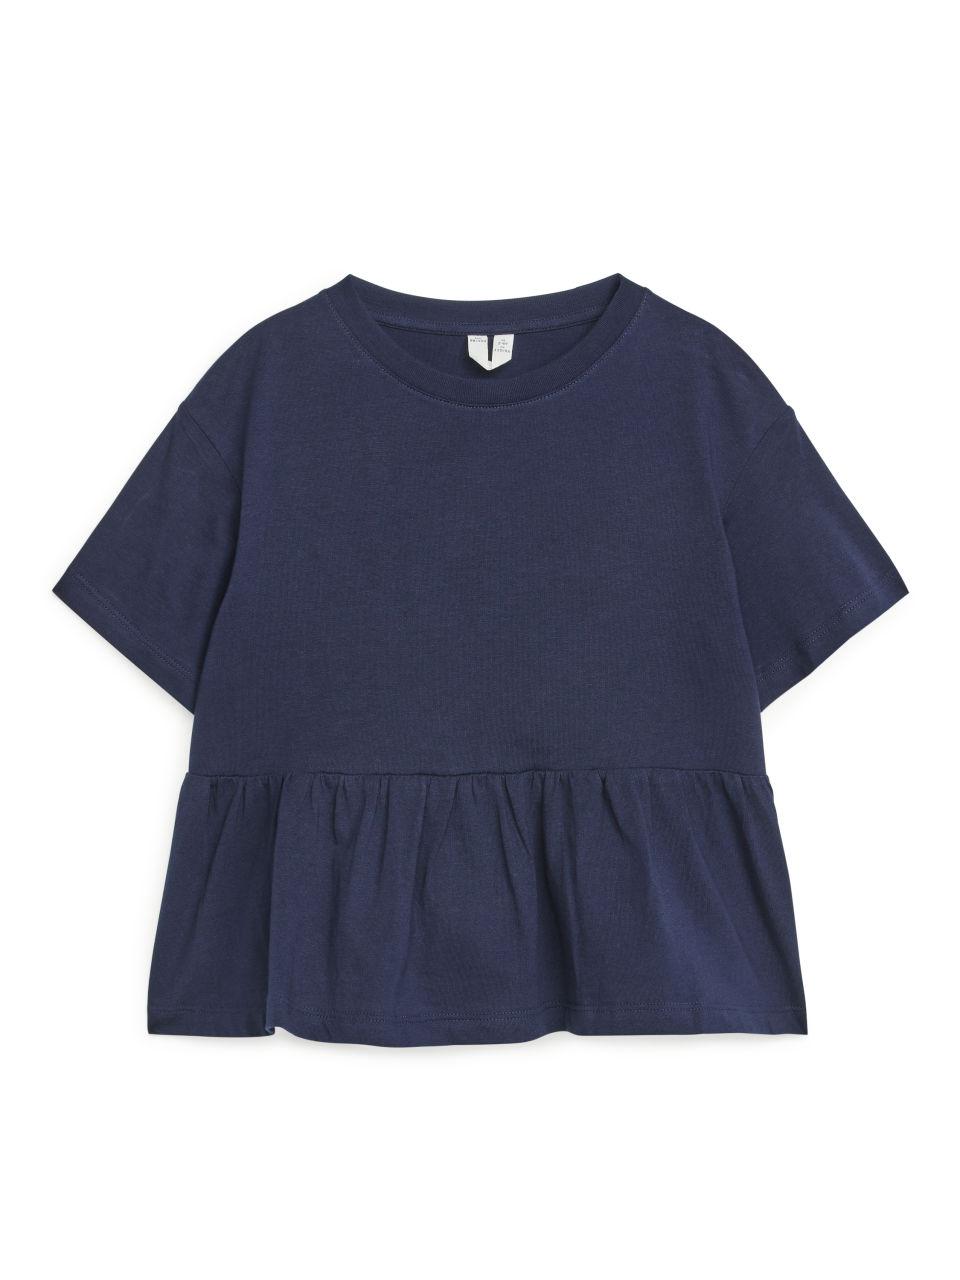 Tiered T-Shirt - Blue